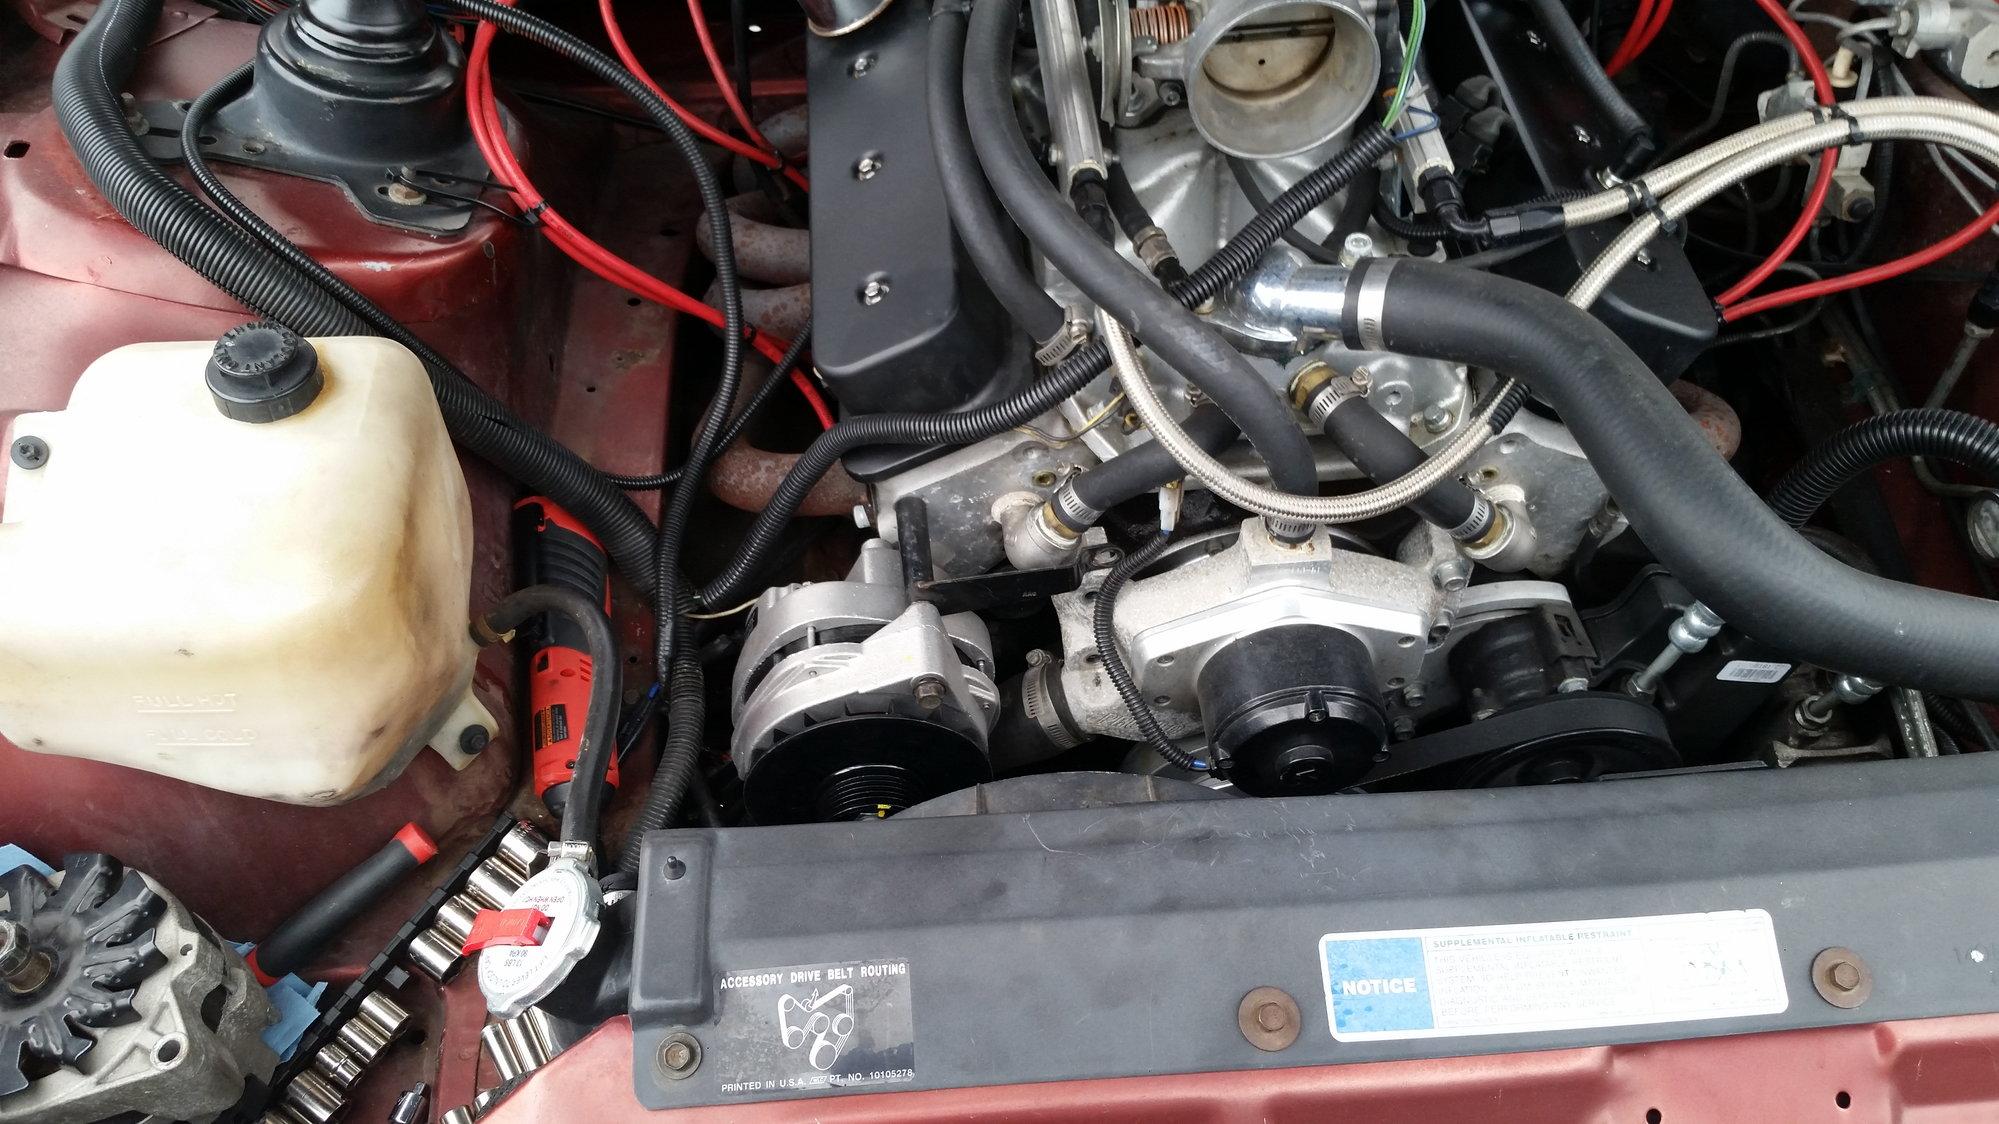 85 Trans Am Radiator Upgrade - Third Generation F-Body